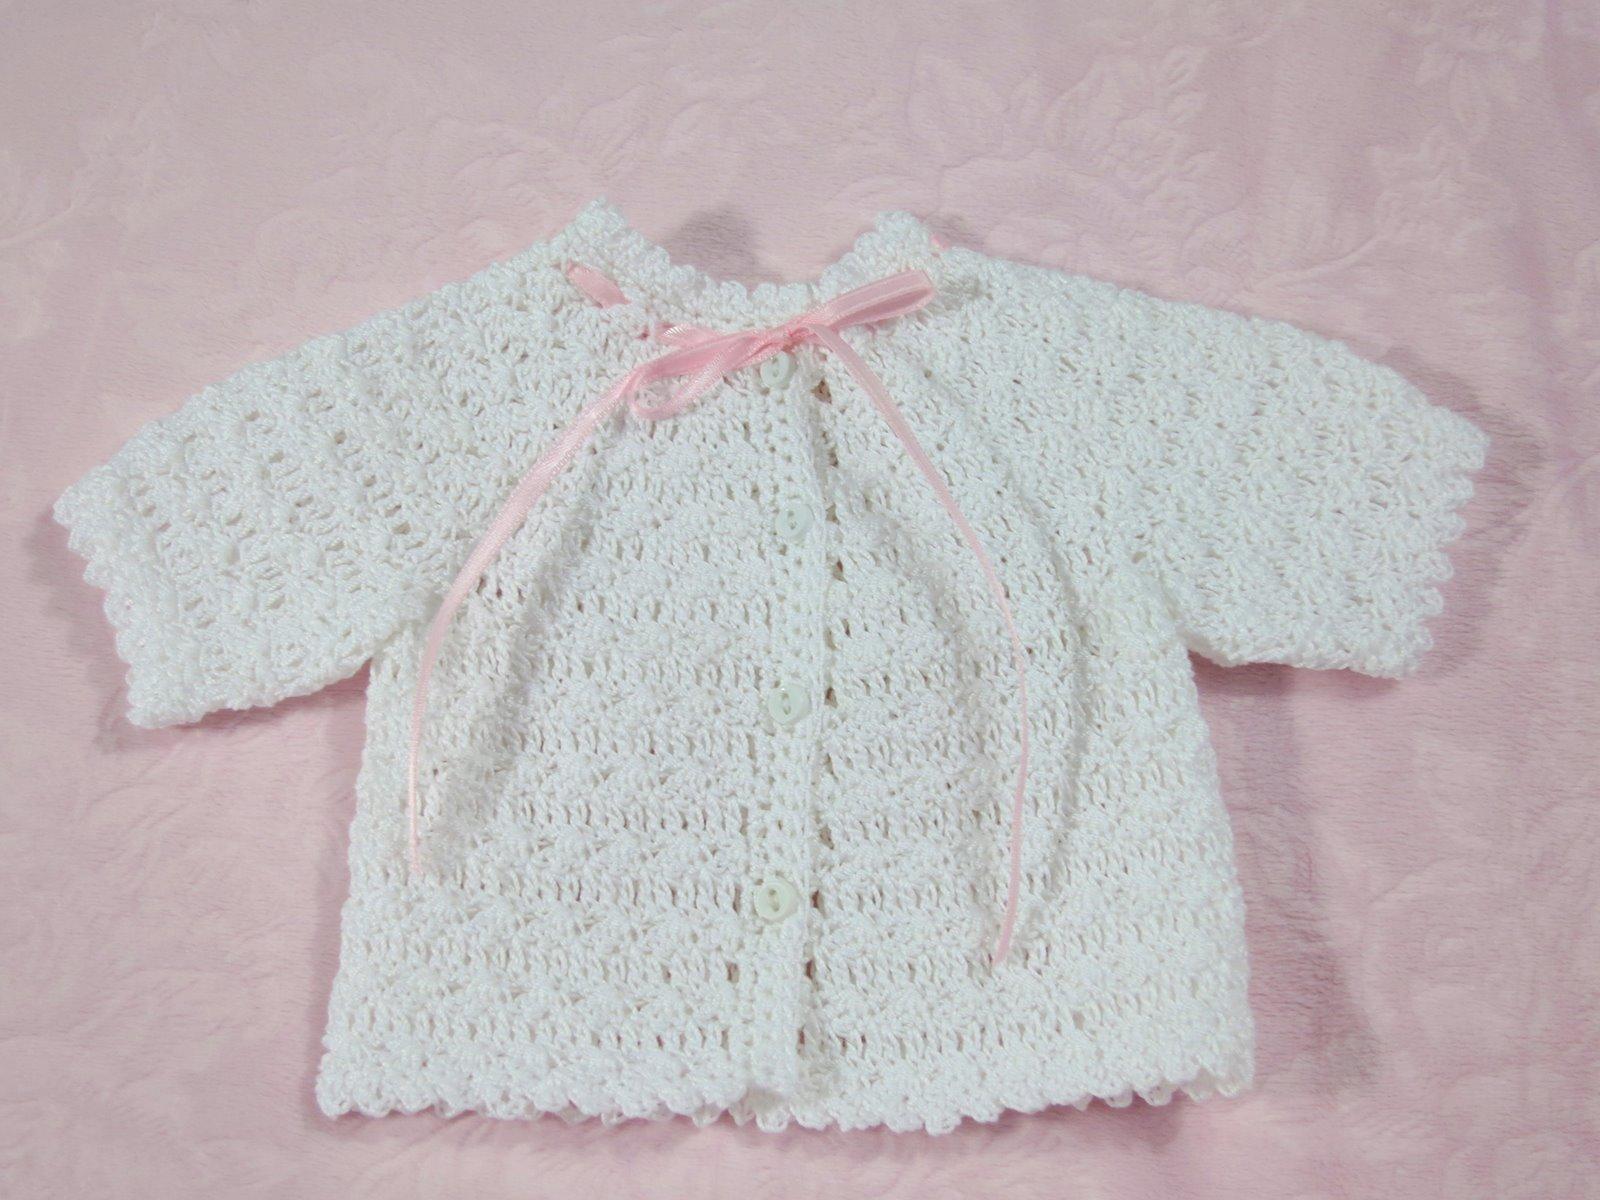 Cheri s Crochet Baby or reborn baby doll clothing or